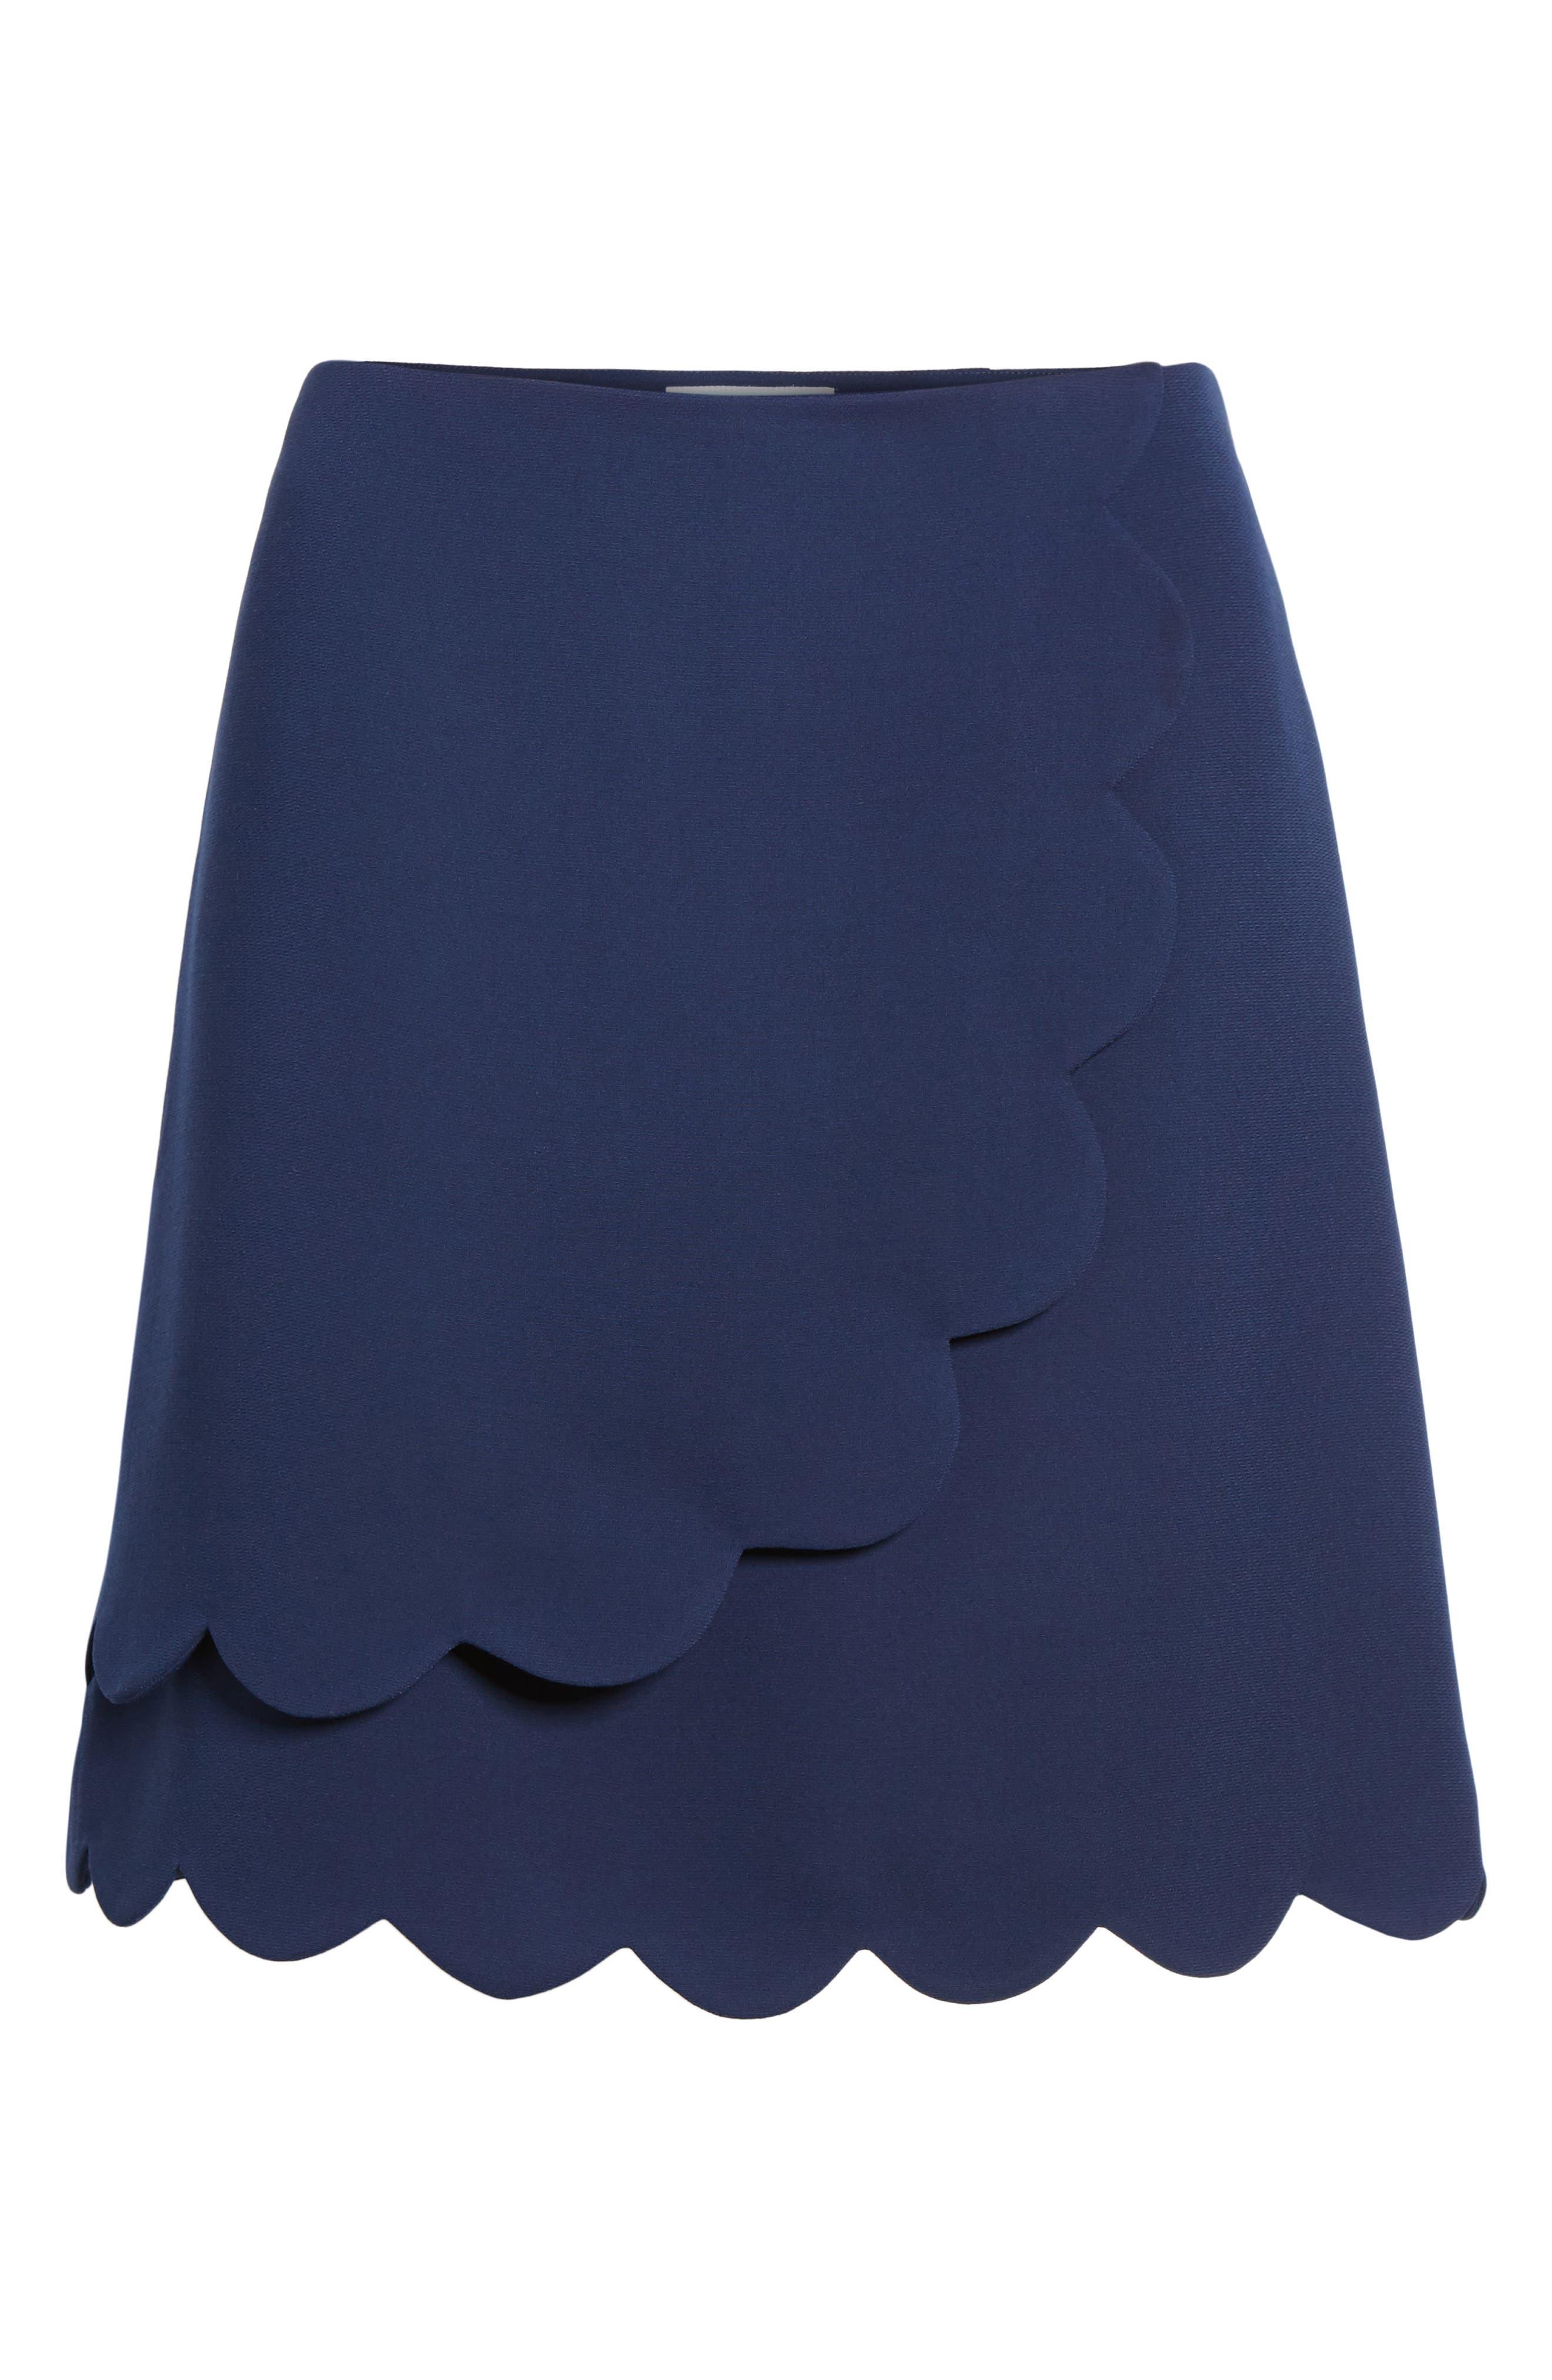 Scallop Skirt,                             Alternate thumbnail 6, color,                             Navy